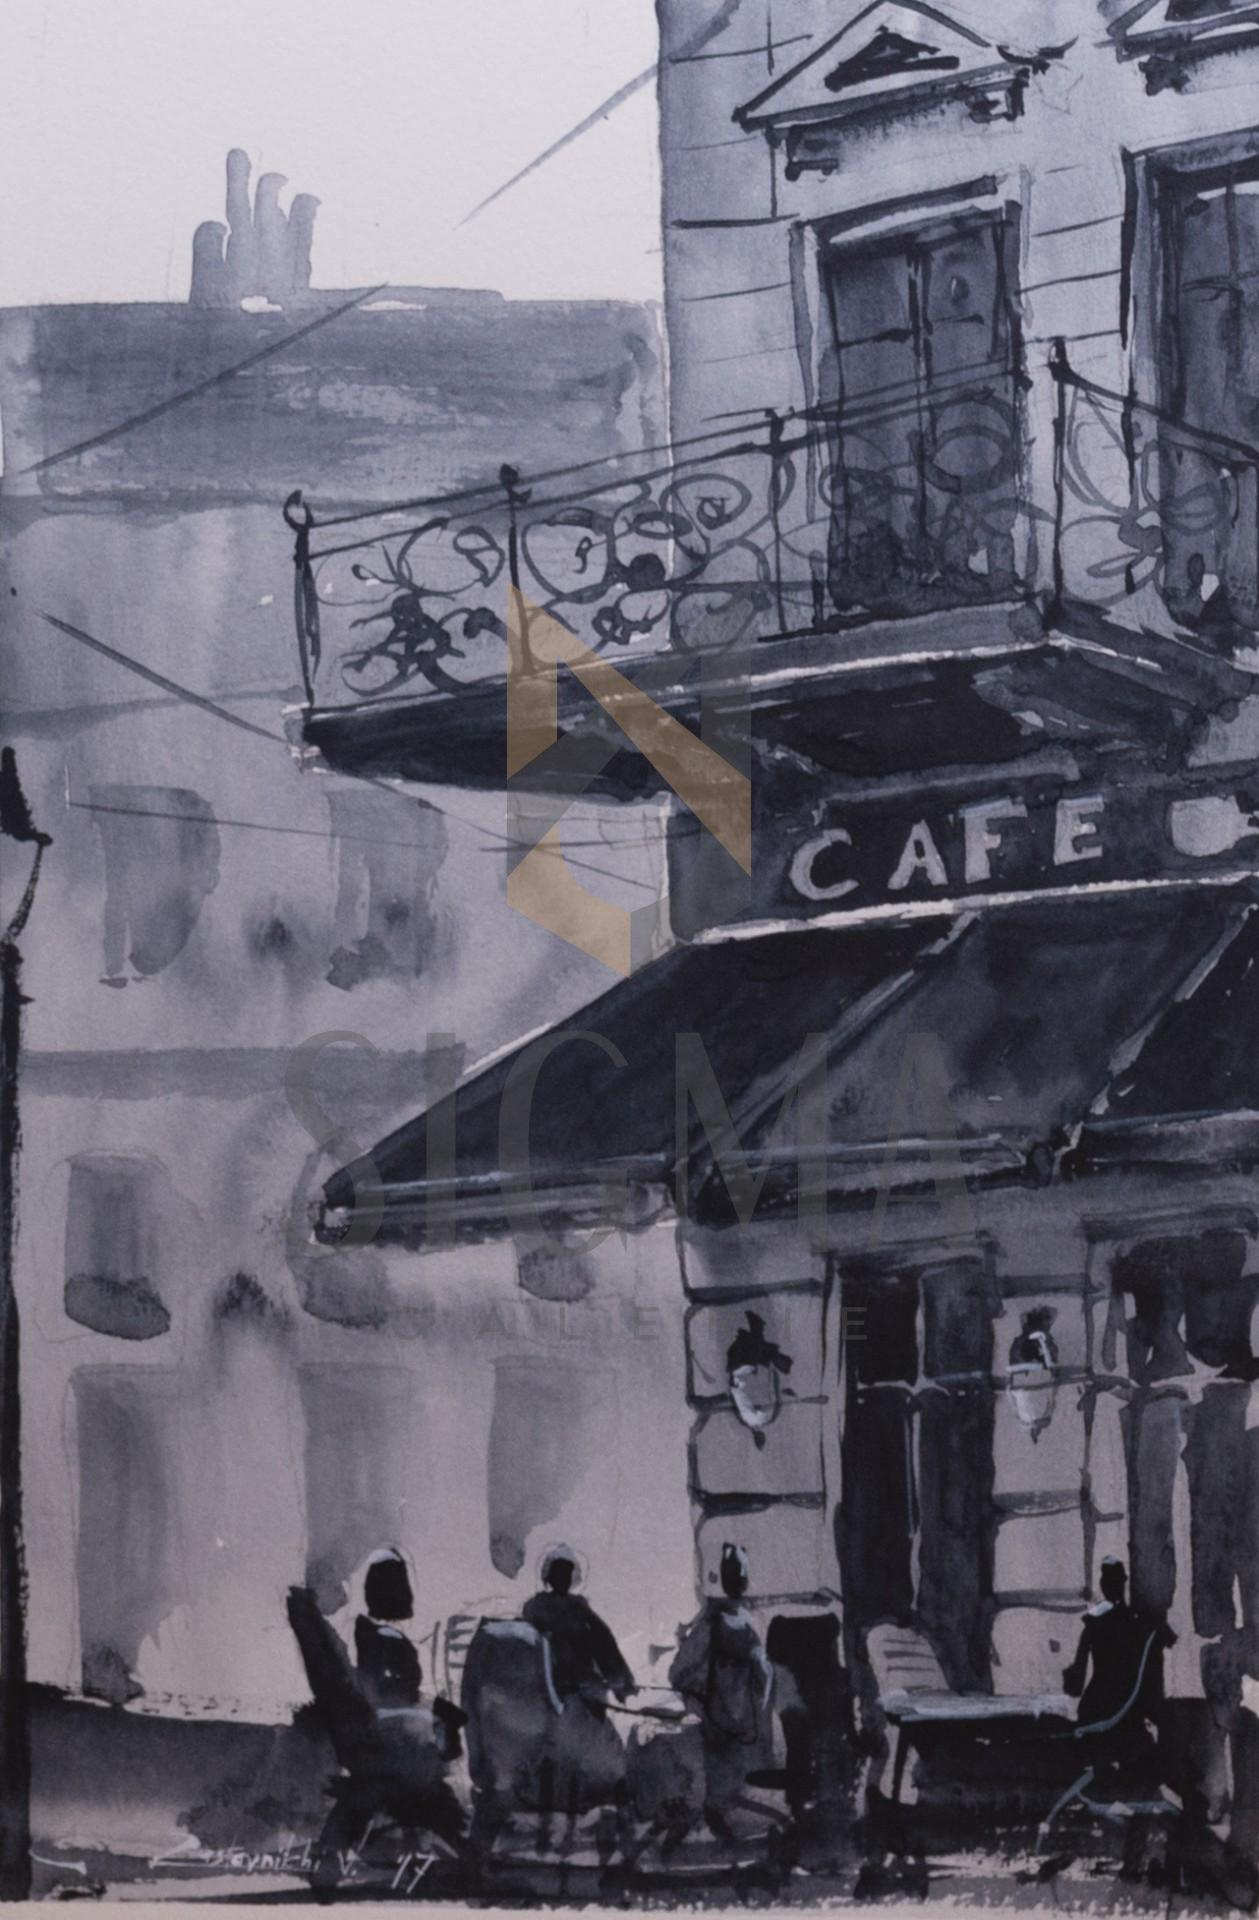 Tablou, Vasile Zastavnitchi, - Caffe - tus, laviu,  29,5x20,5 cm